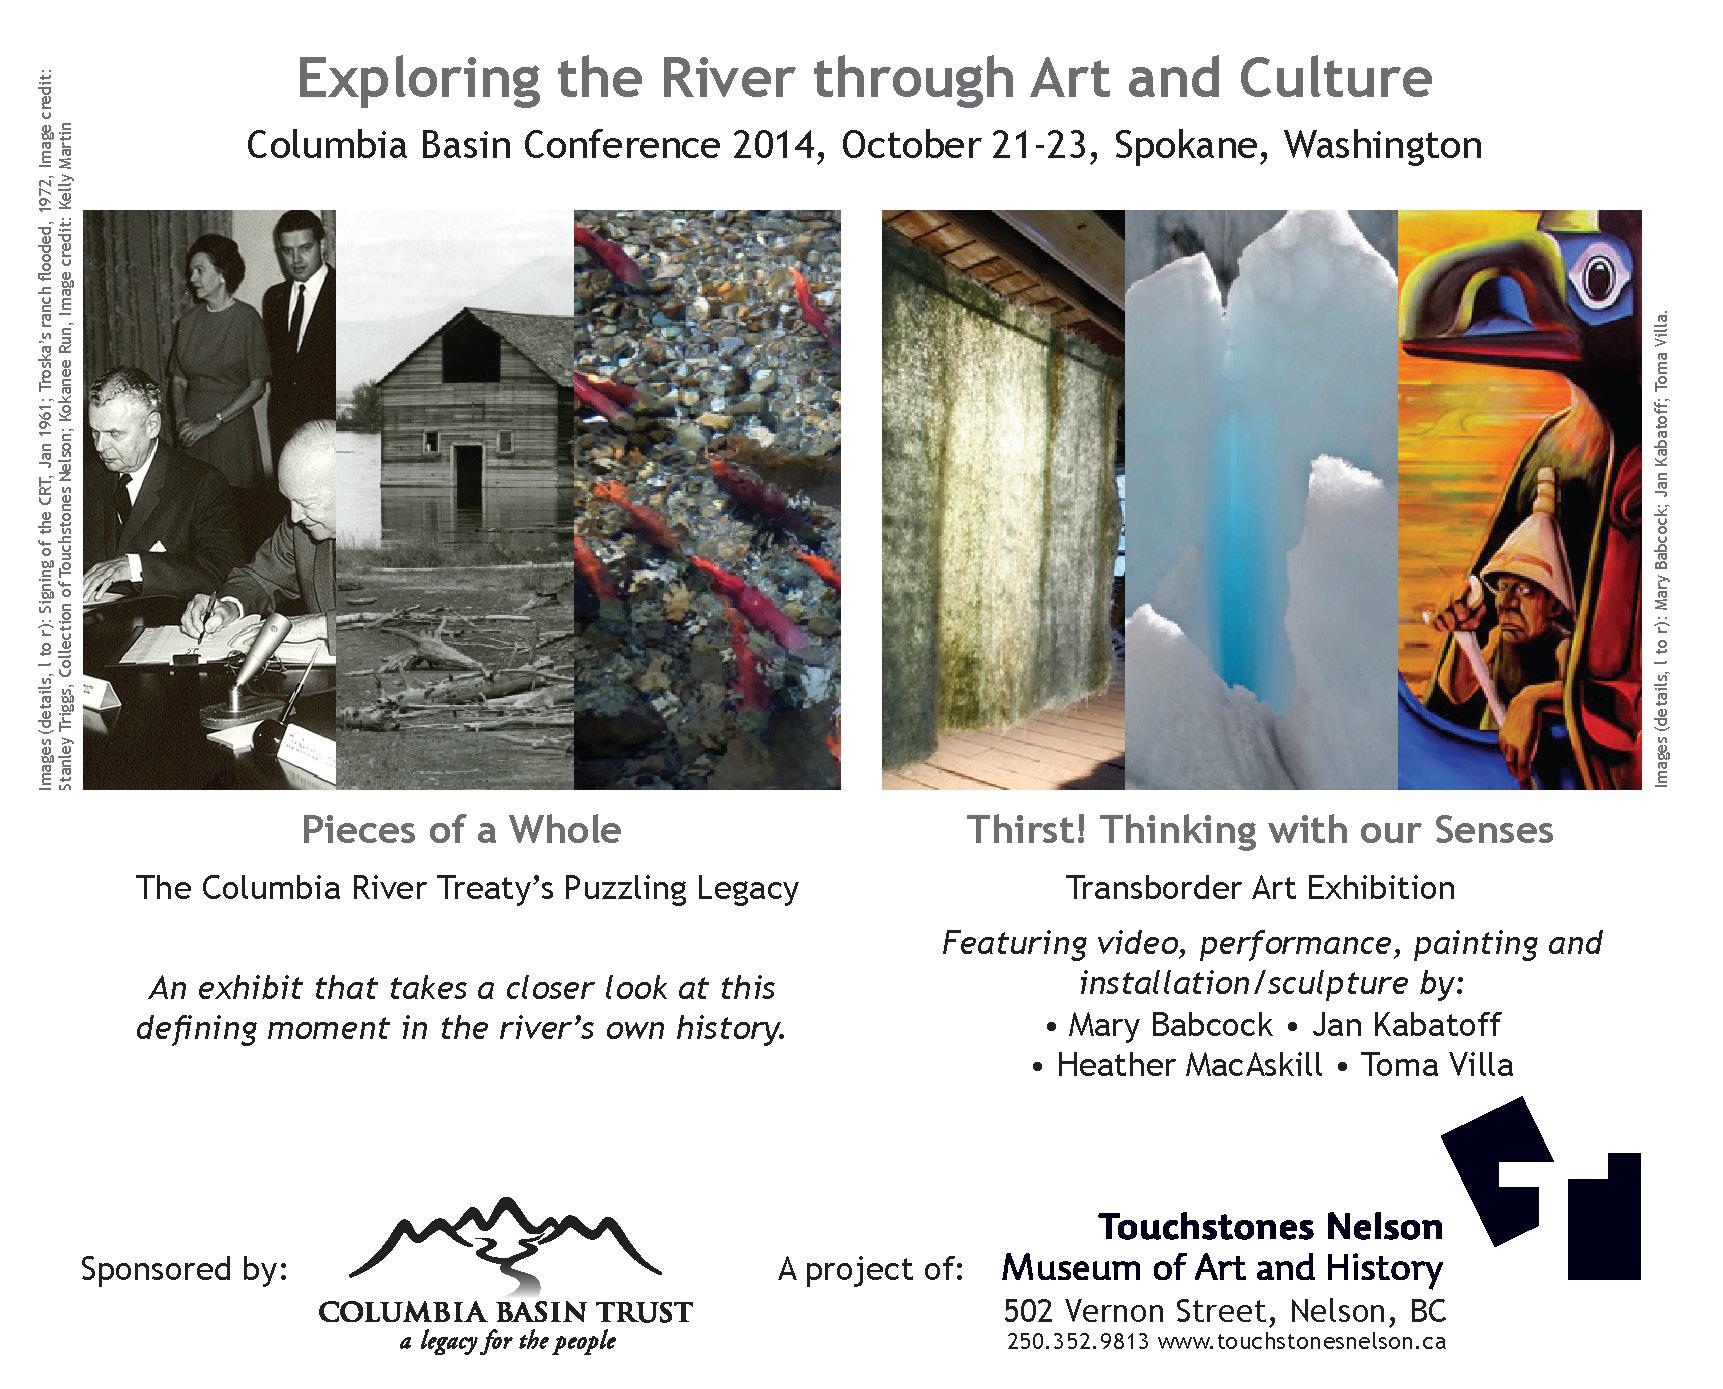 http://columbiabasincoordinator.files.wordpress.com/2014/06/2-exhibits-in-spokane_r2.jpg